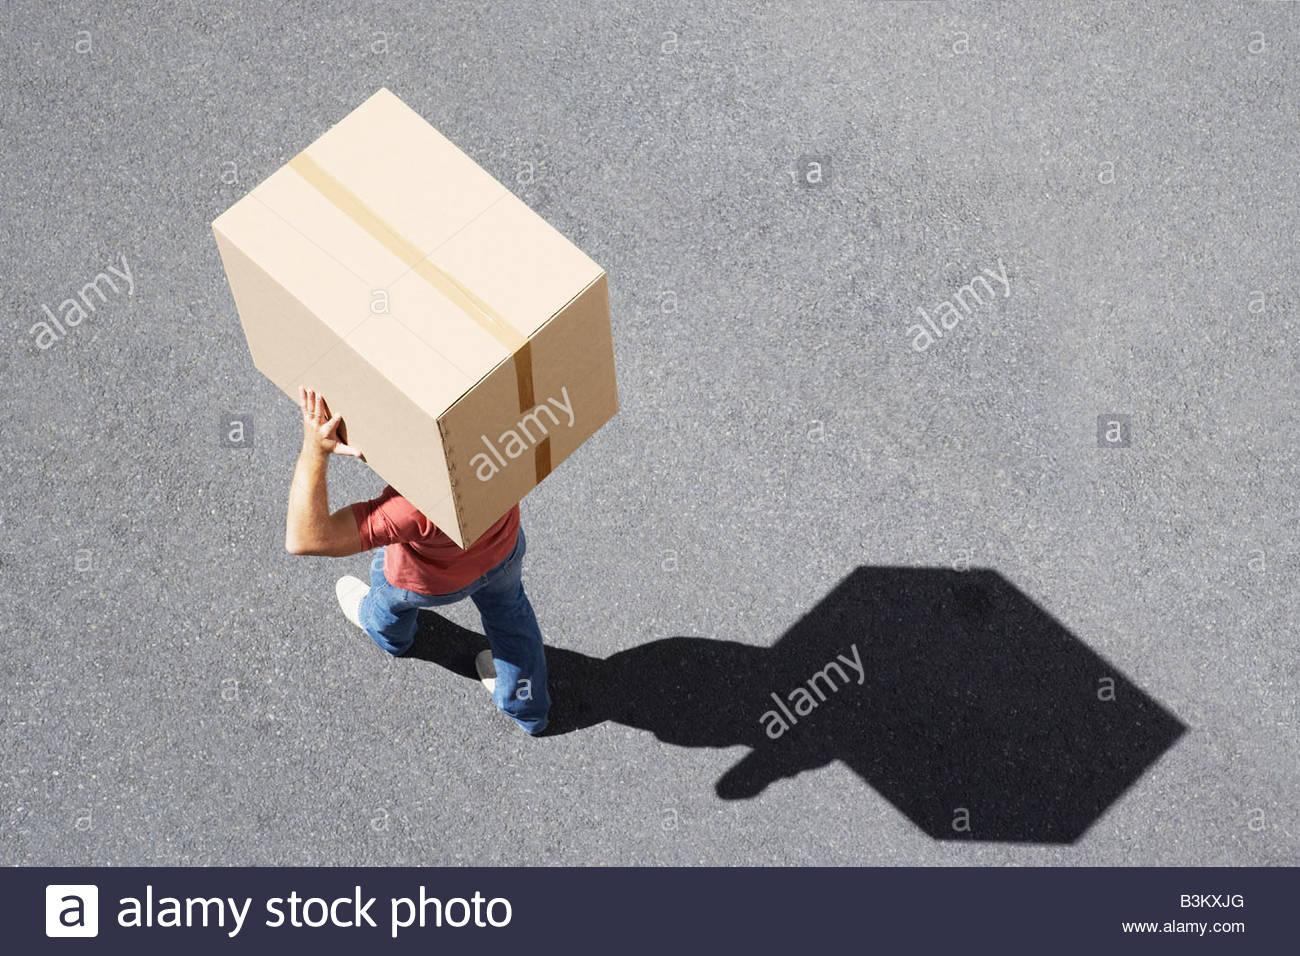 Man carrying box - Stock Image